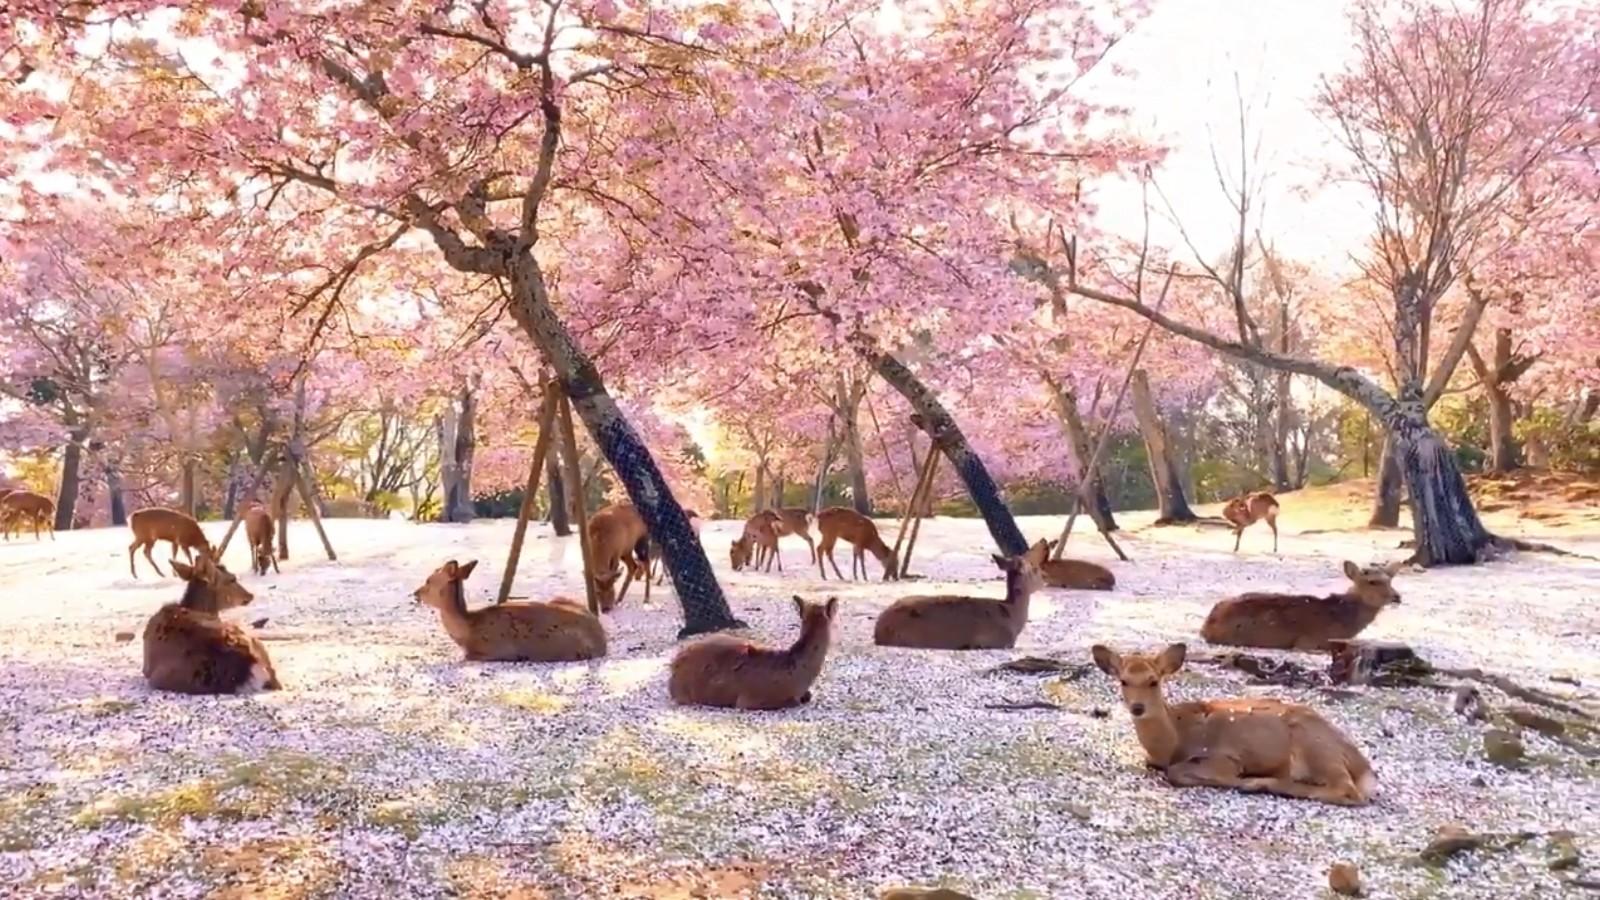 ▲▼奈良的夢幻美景。(圖/翻攝自Twitter/KikiPhotoWorks)